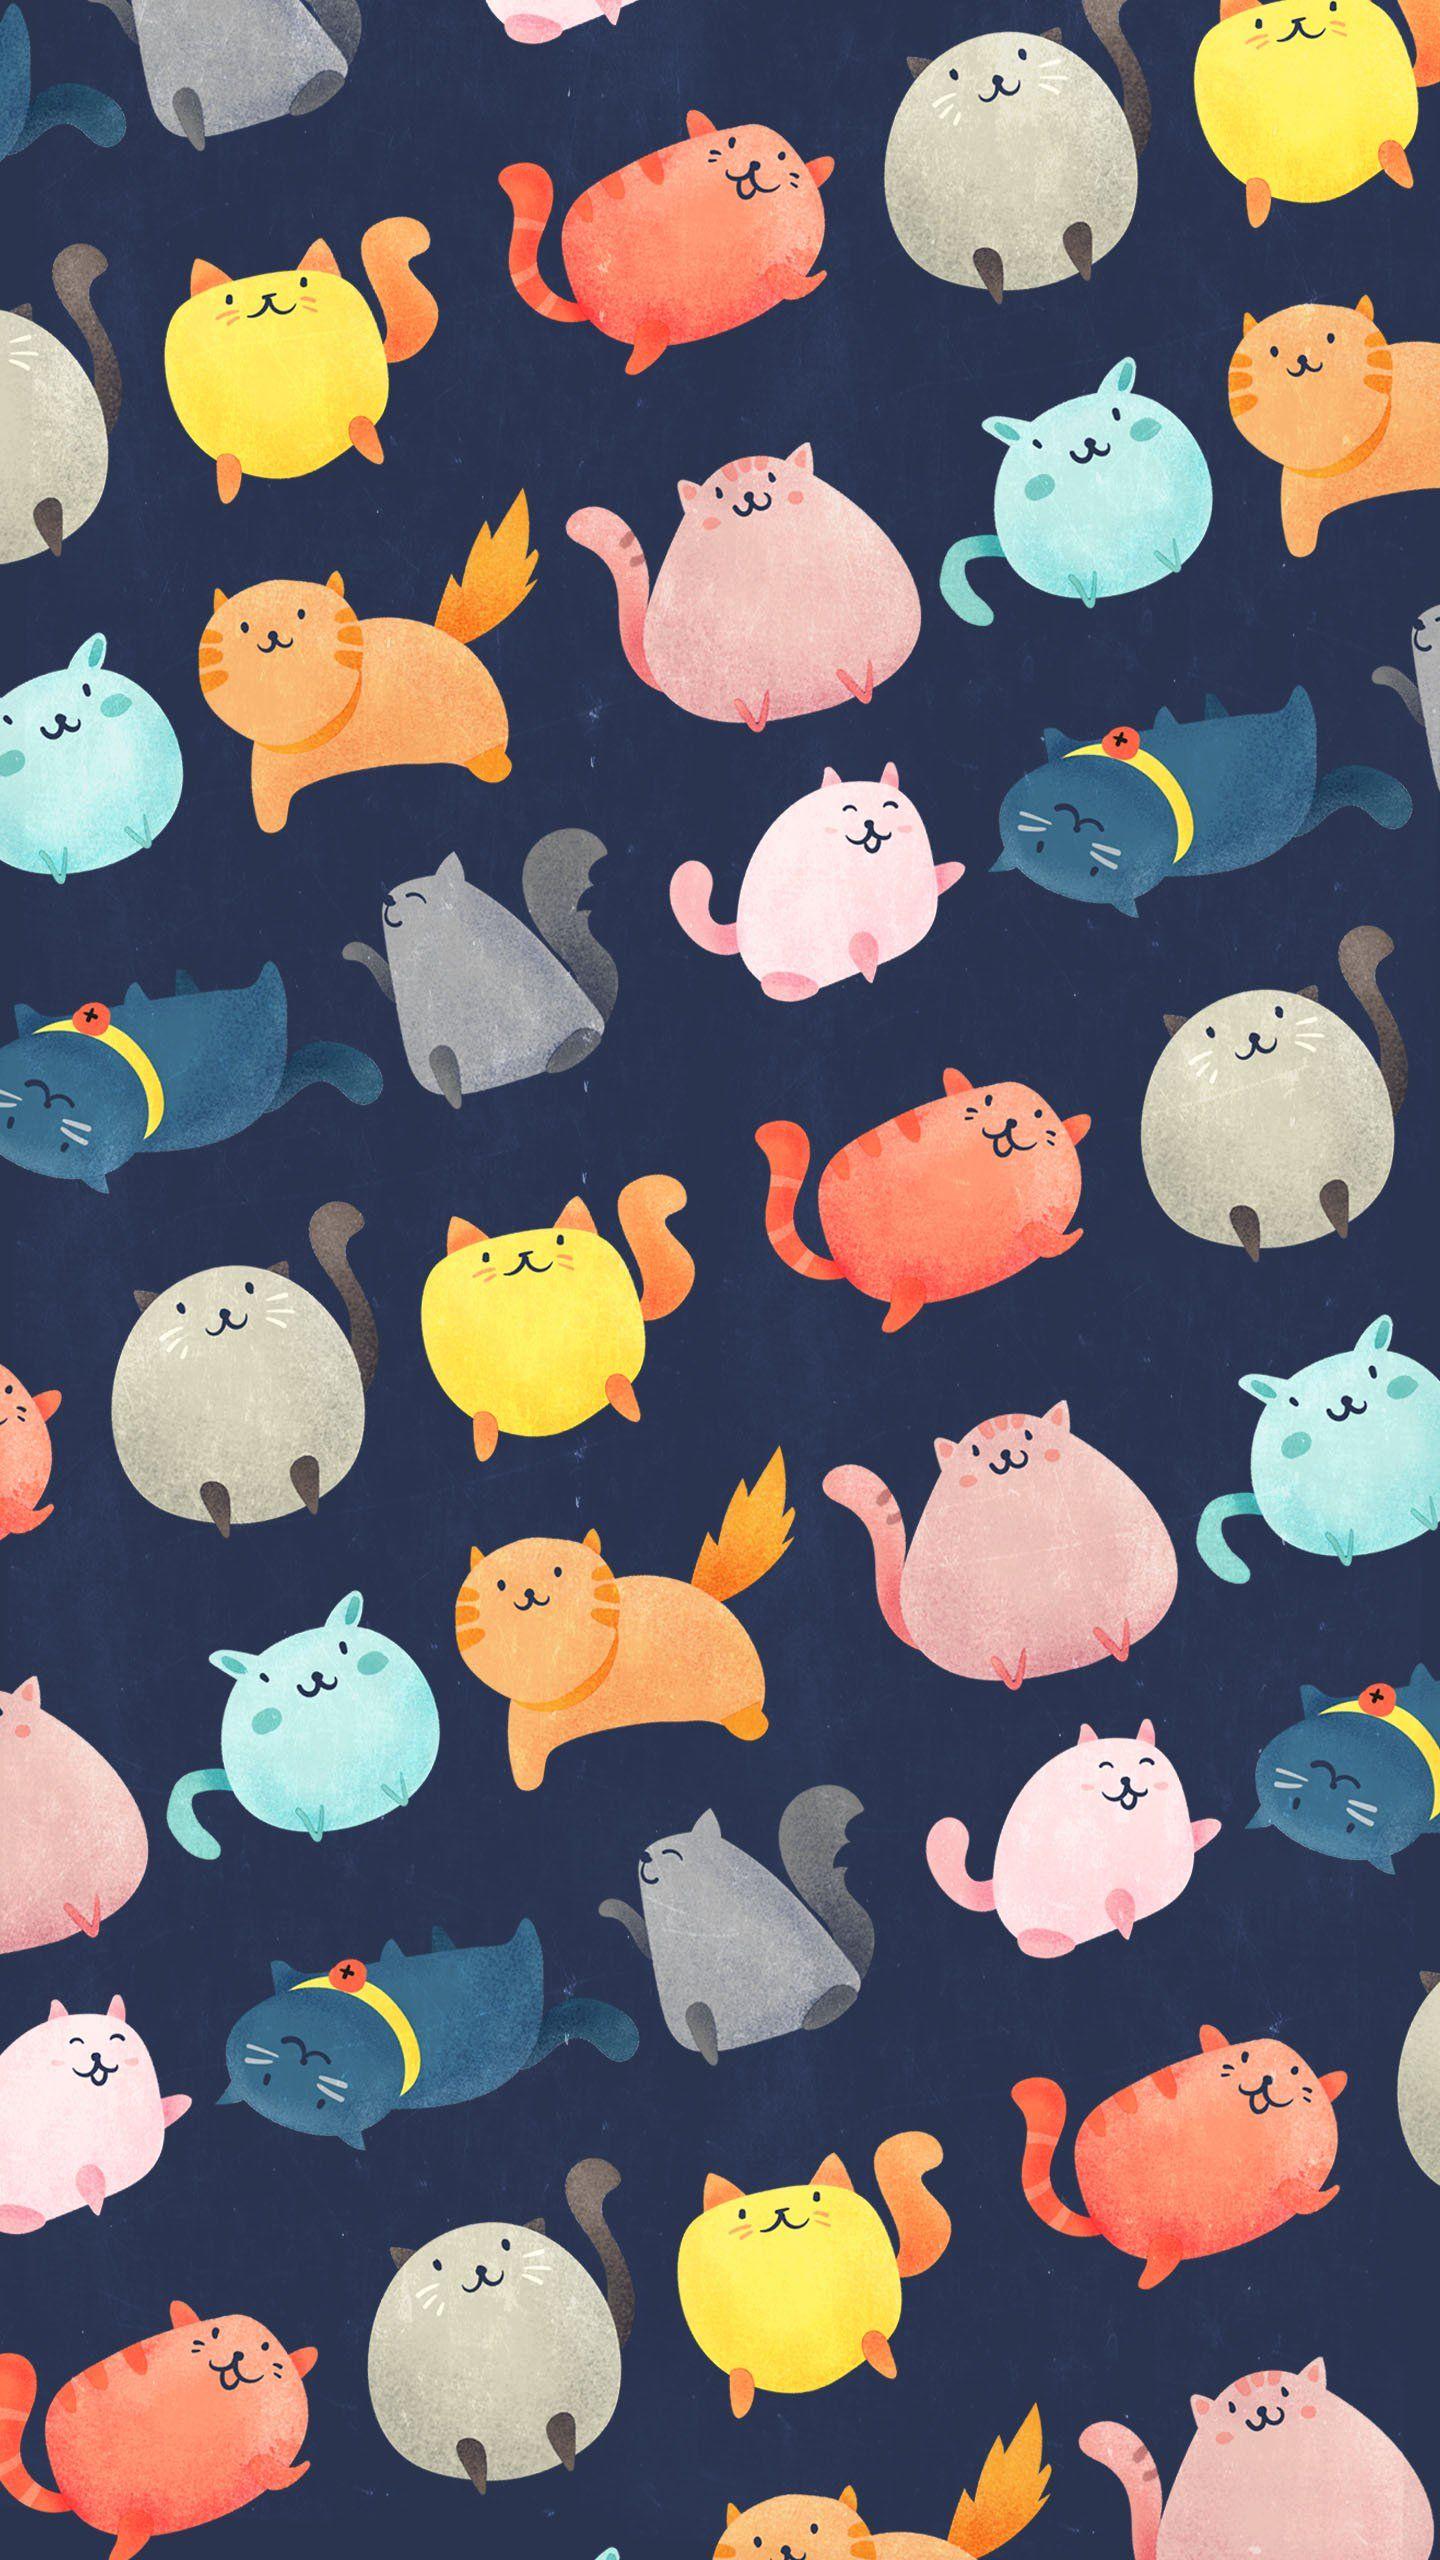 10 Super Photo Kittens Wallpapers Blogalineribeiro Wallpaper Cat Kitten Wallpaper Cat Wallpaper Cute Cat Wallpaper